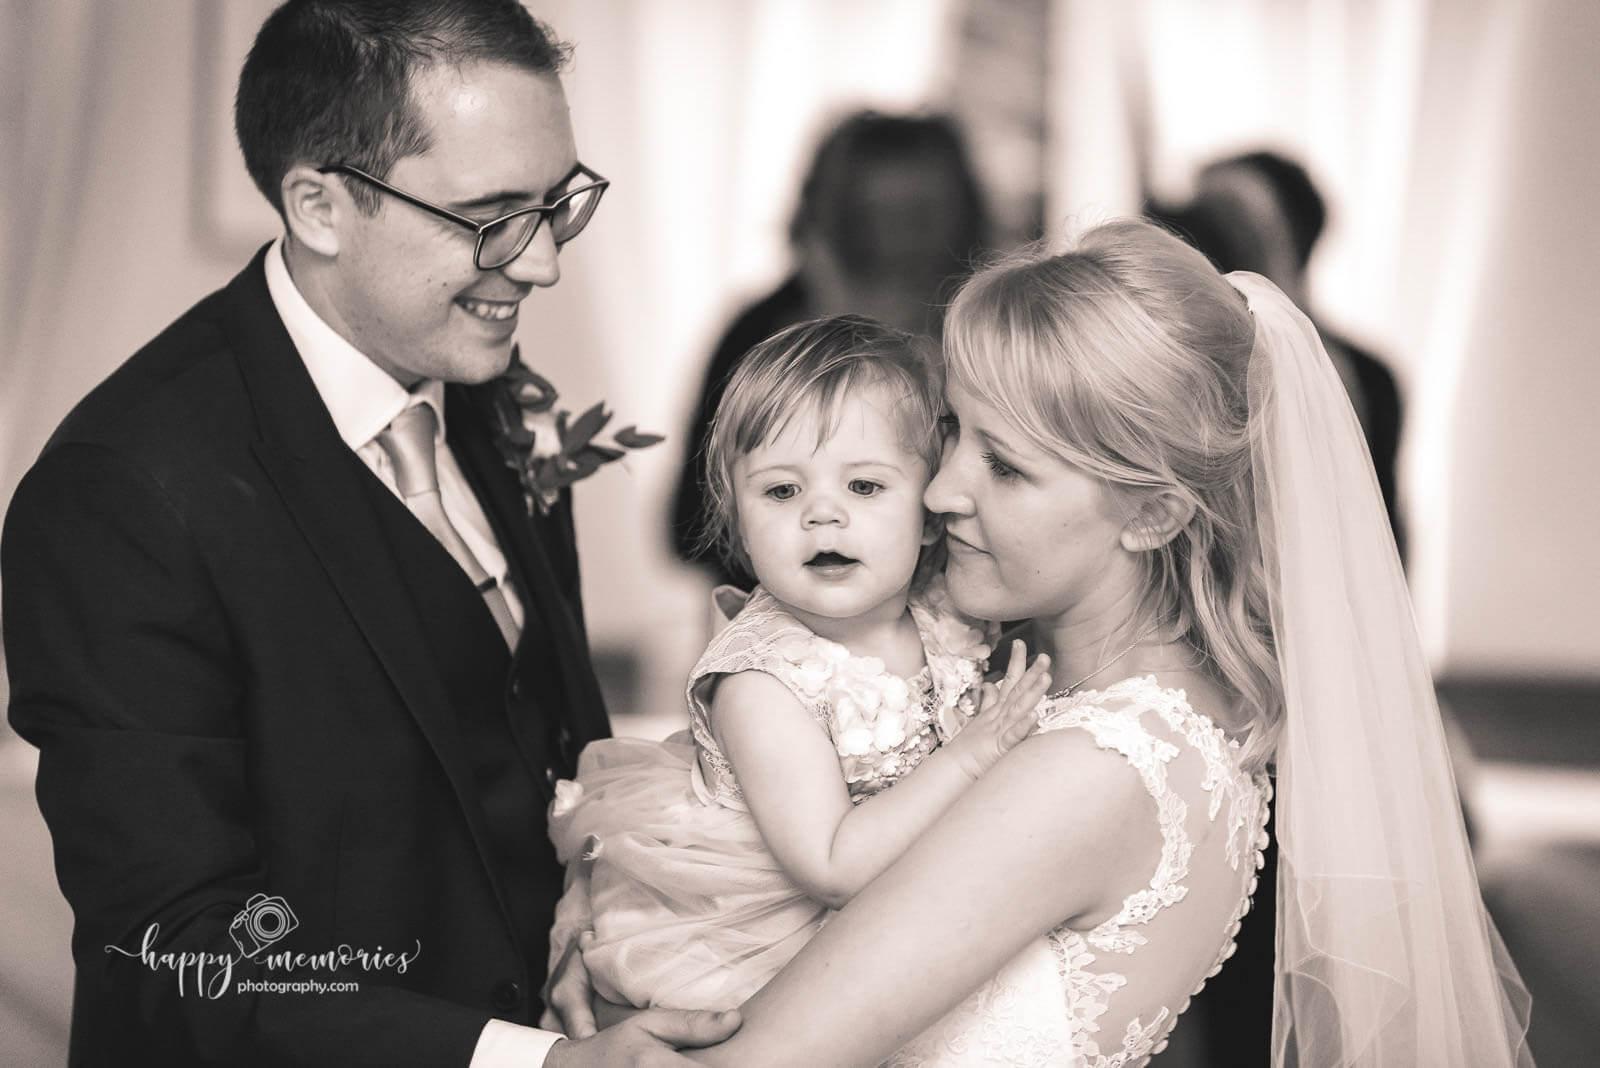 Wedding photographer East Grinstead-38